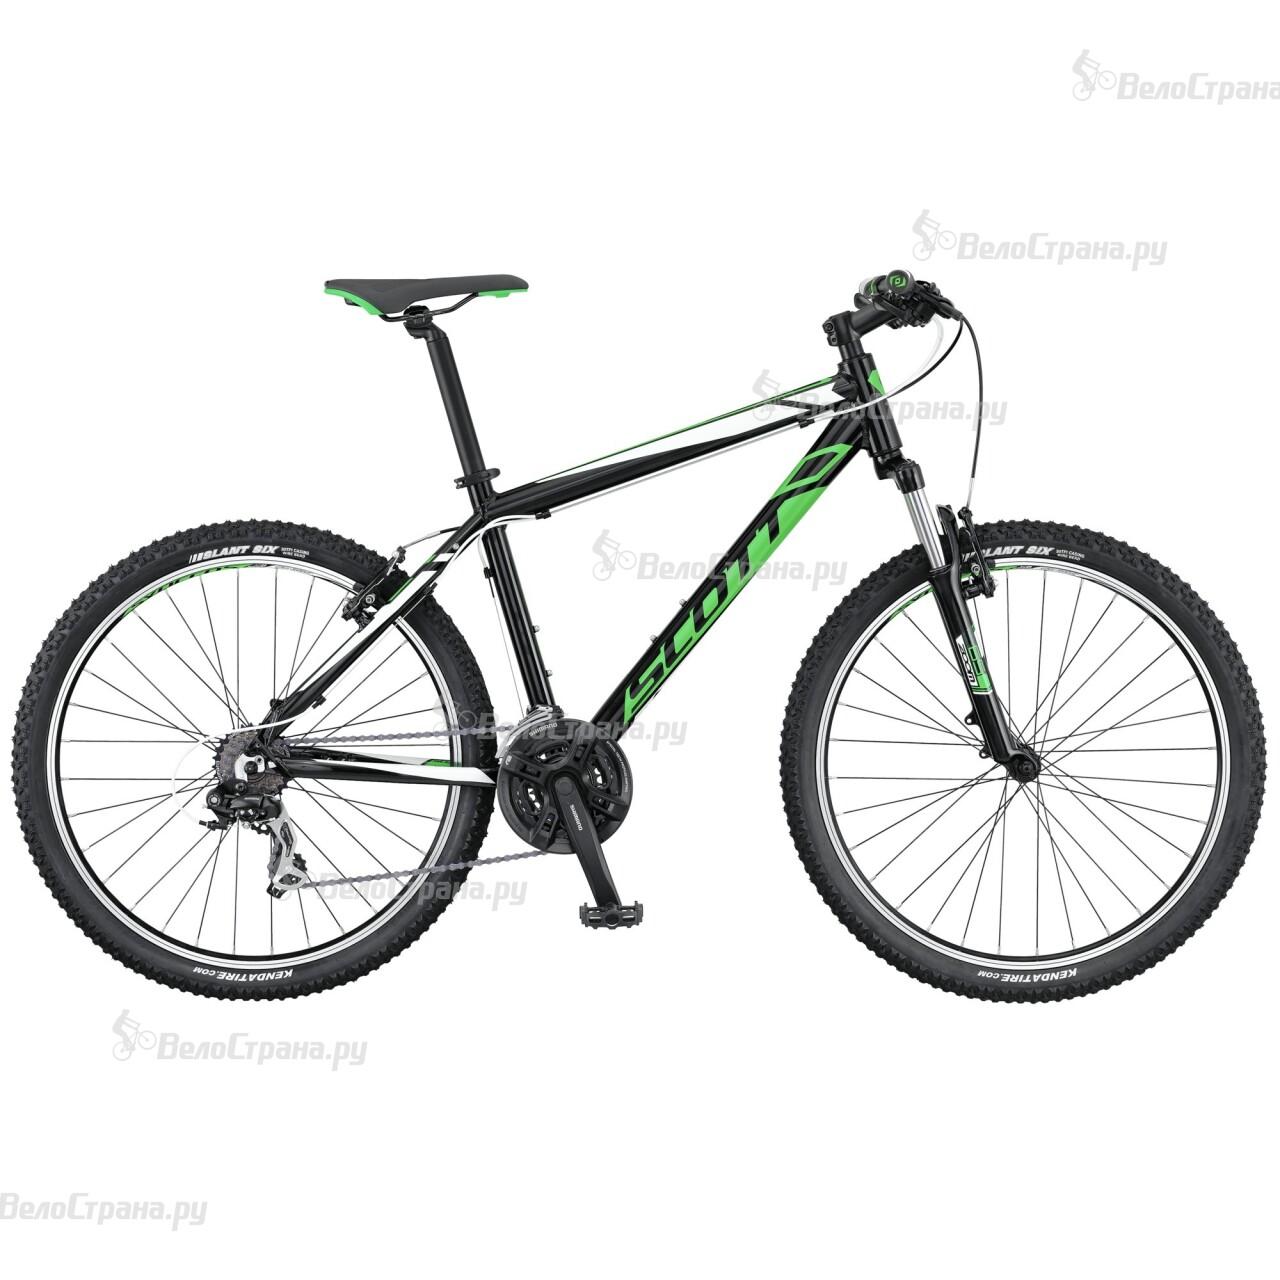 Велосипед Scott Aspect 670 (2016)